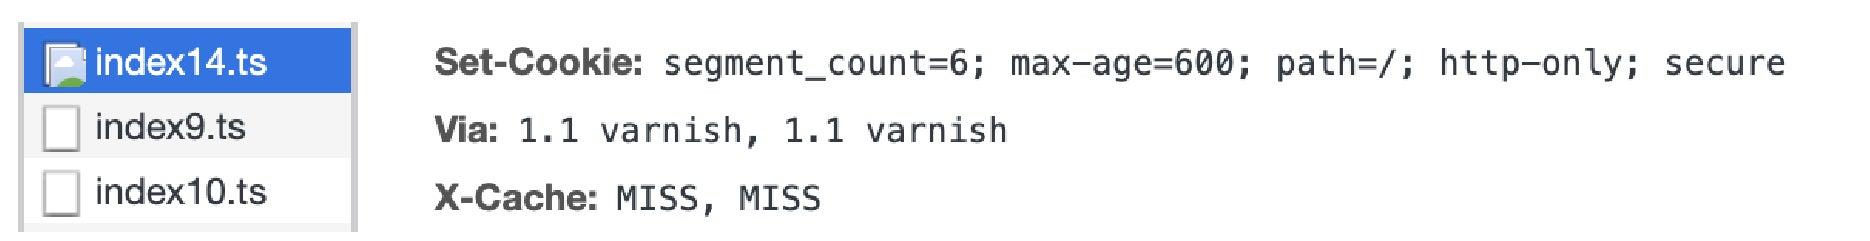 segment count 6